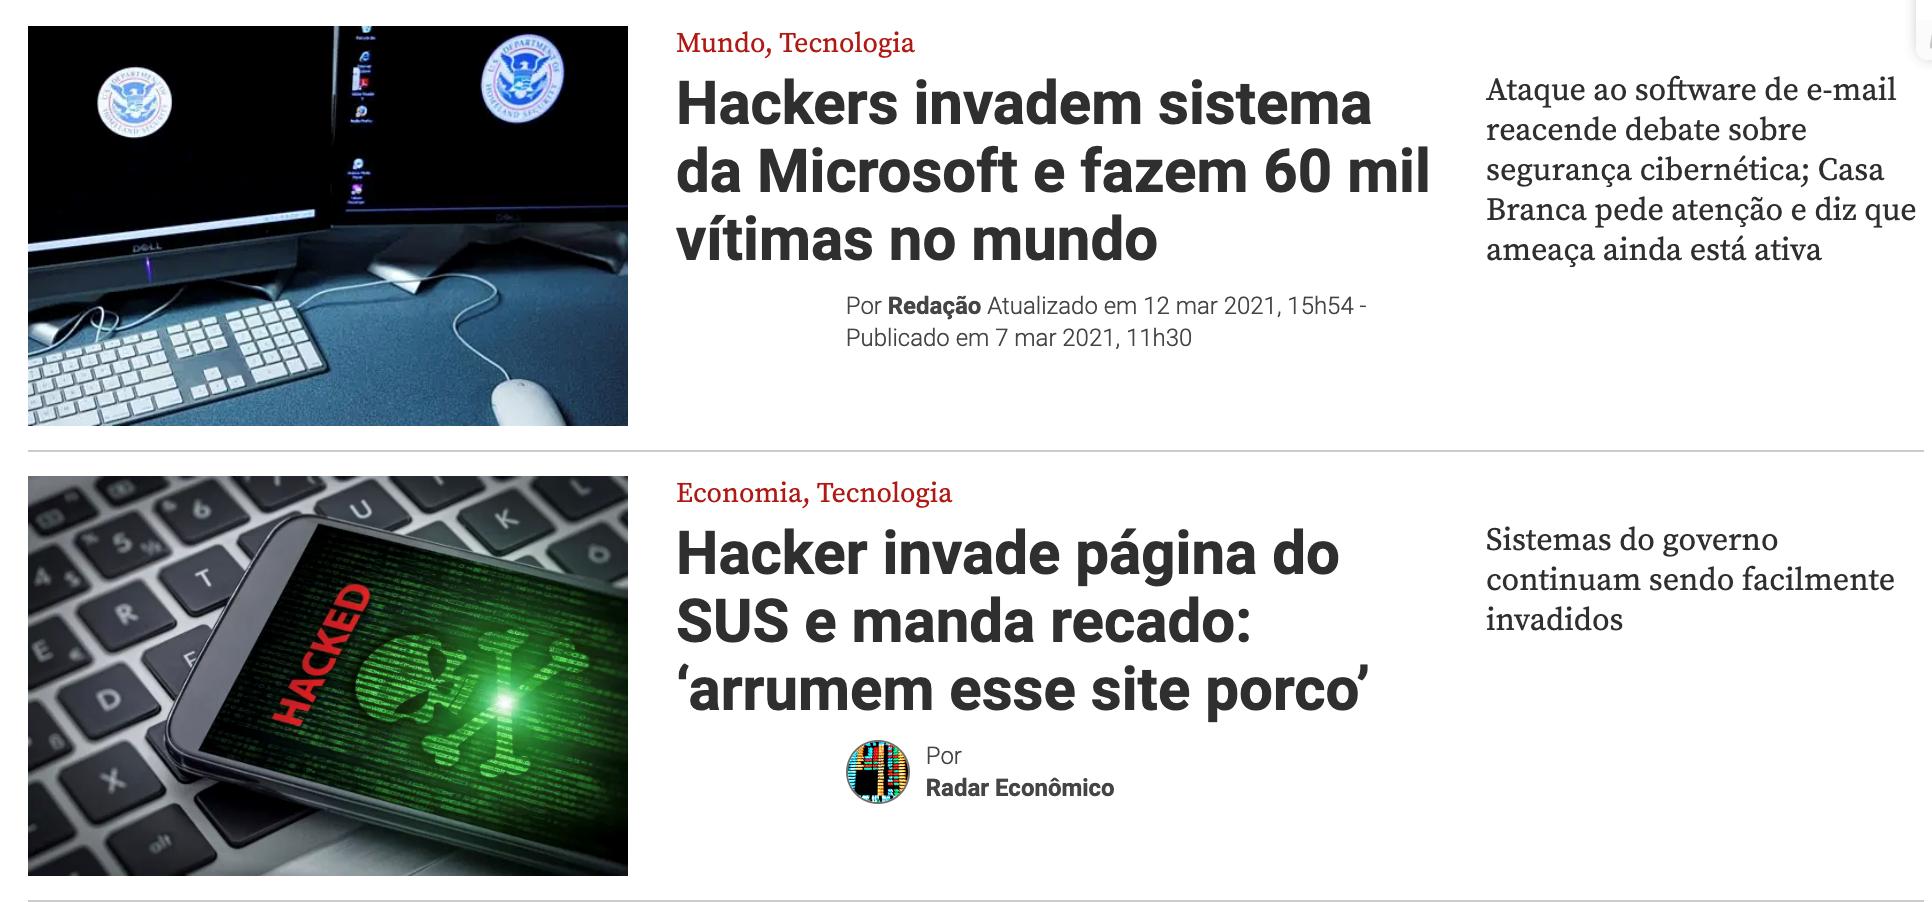 Made4it - ciberneticos4